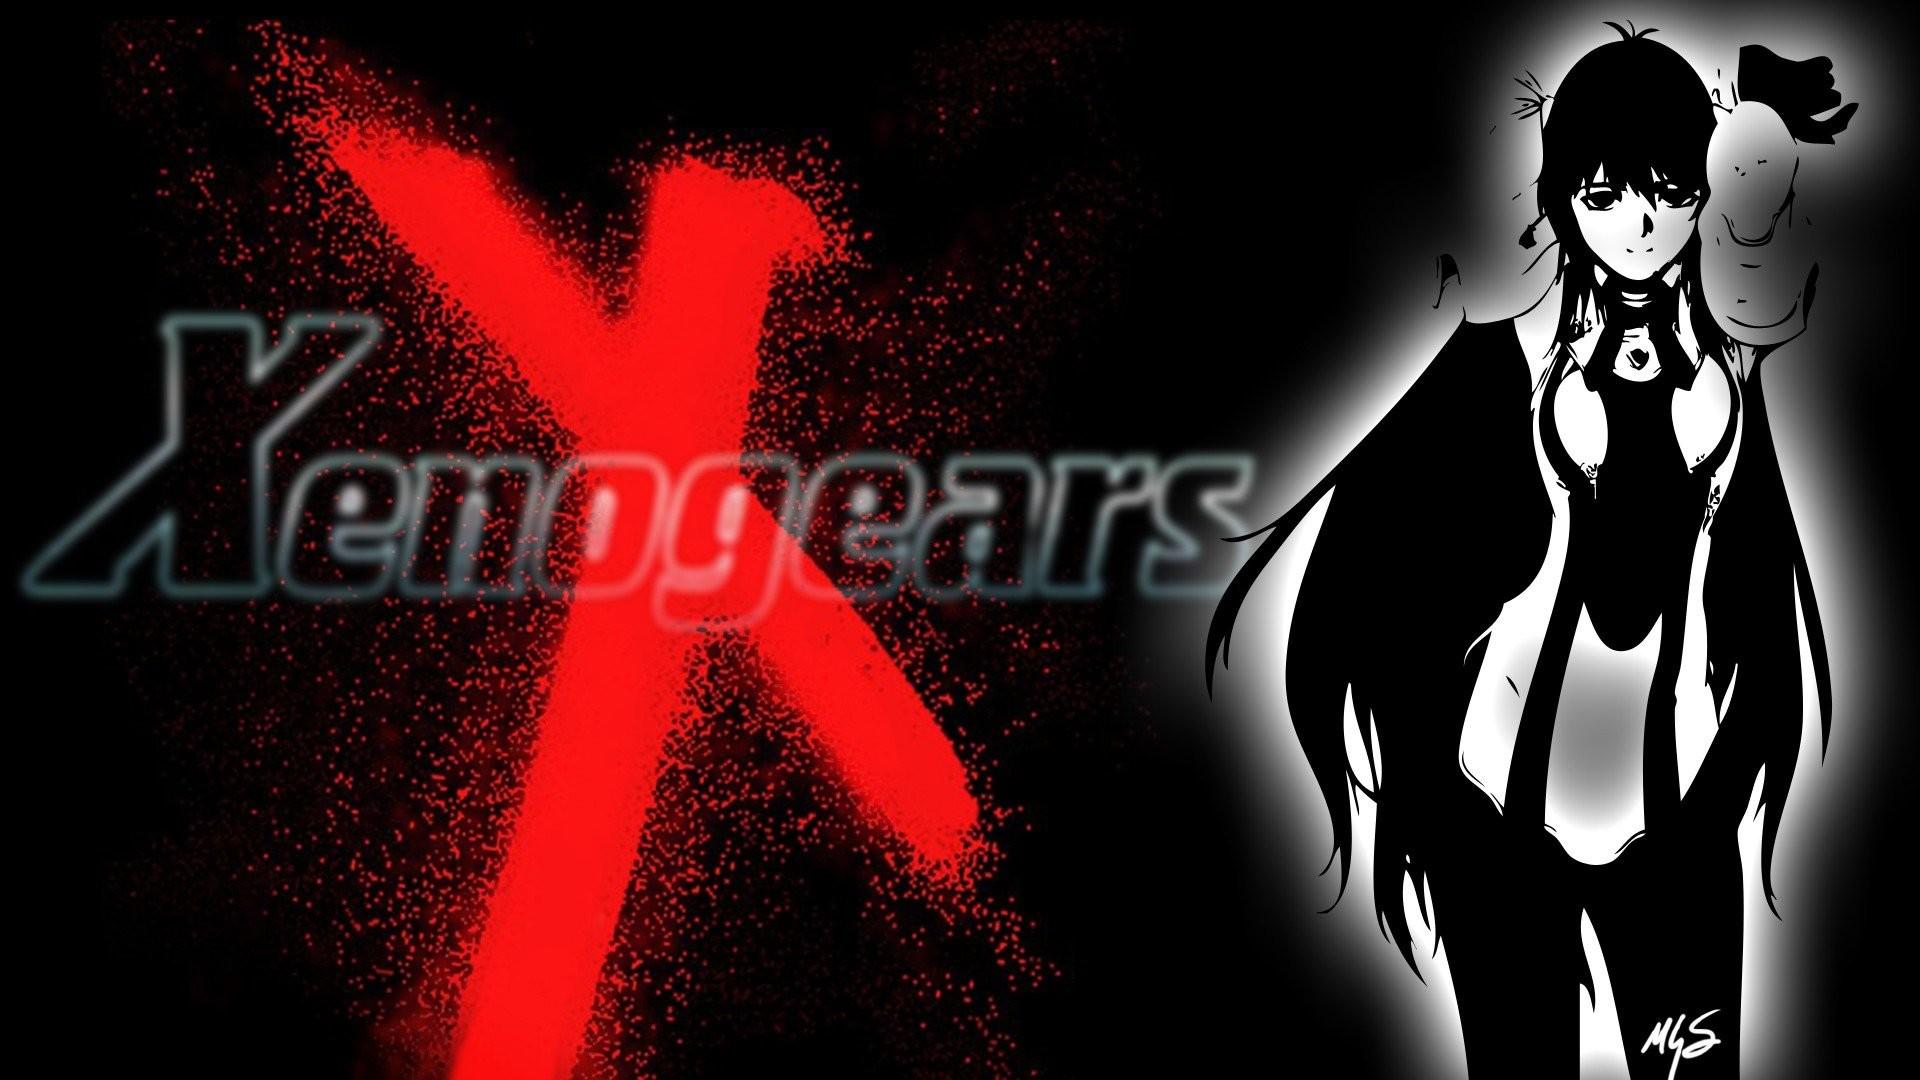 video games RPG Xenogears anime Elhaym Van Houten Elly anime girls wallpaper  …